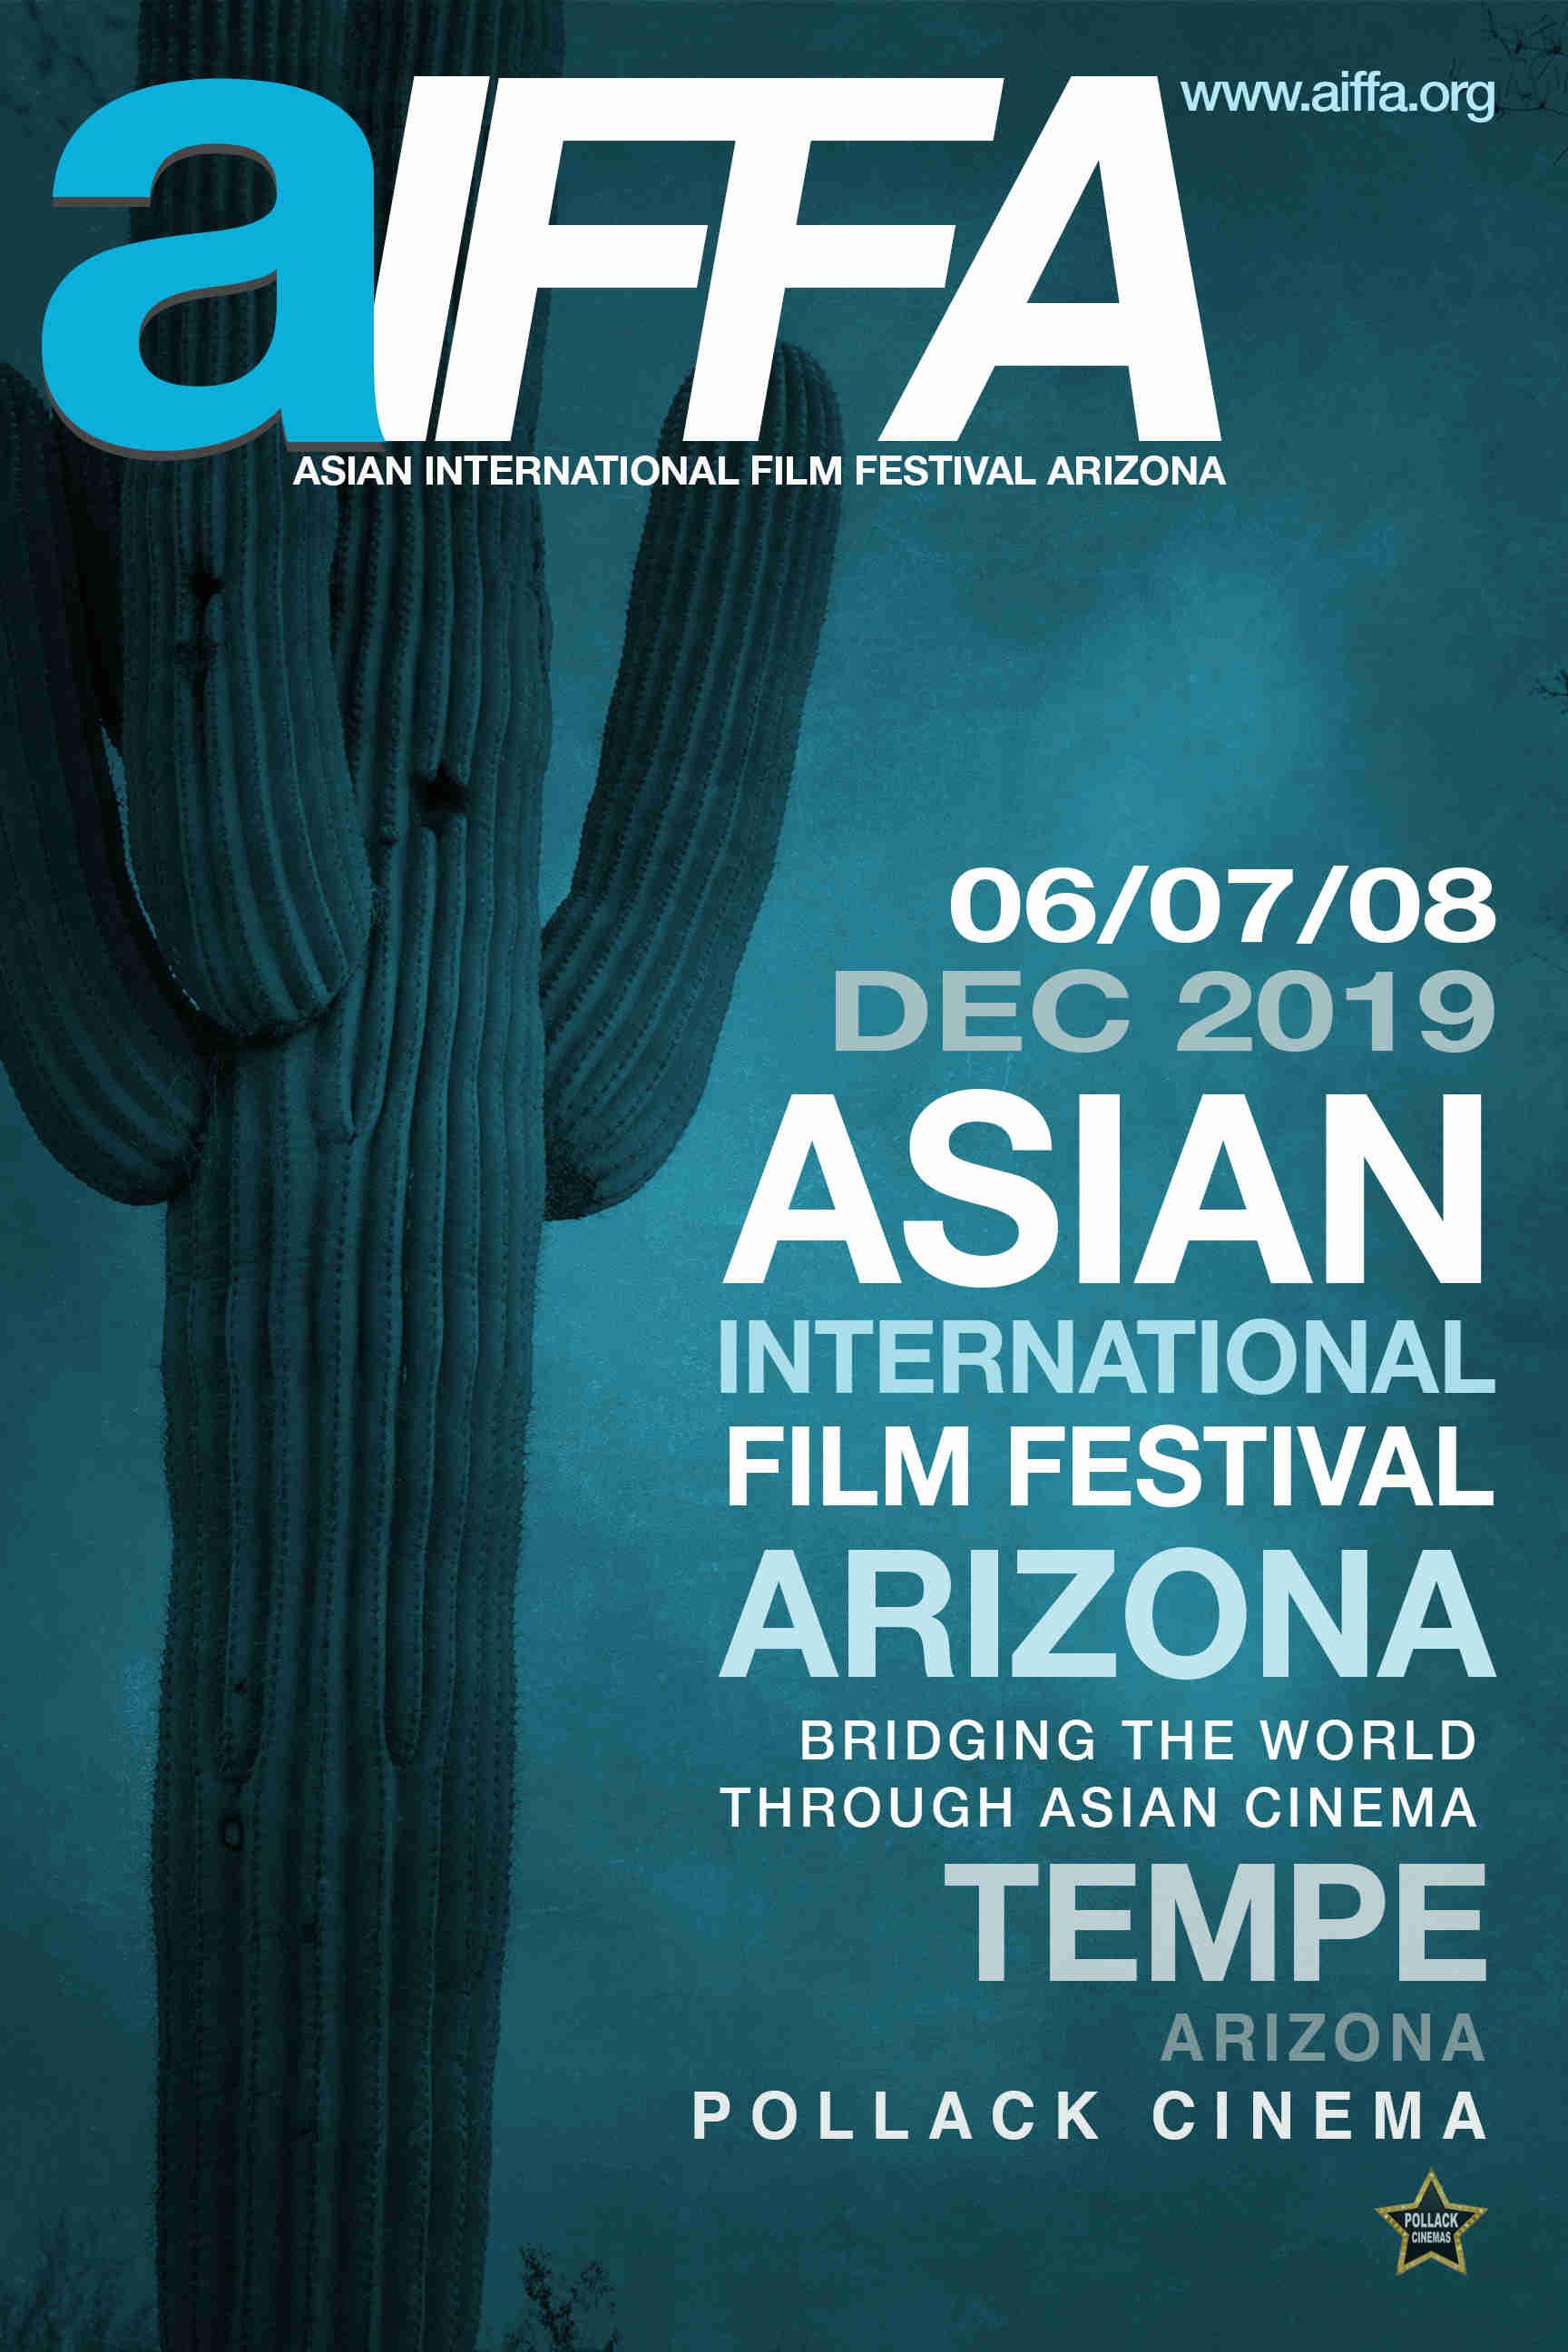 AIFFA Film Festival